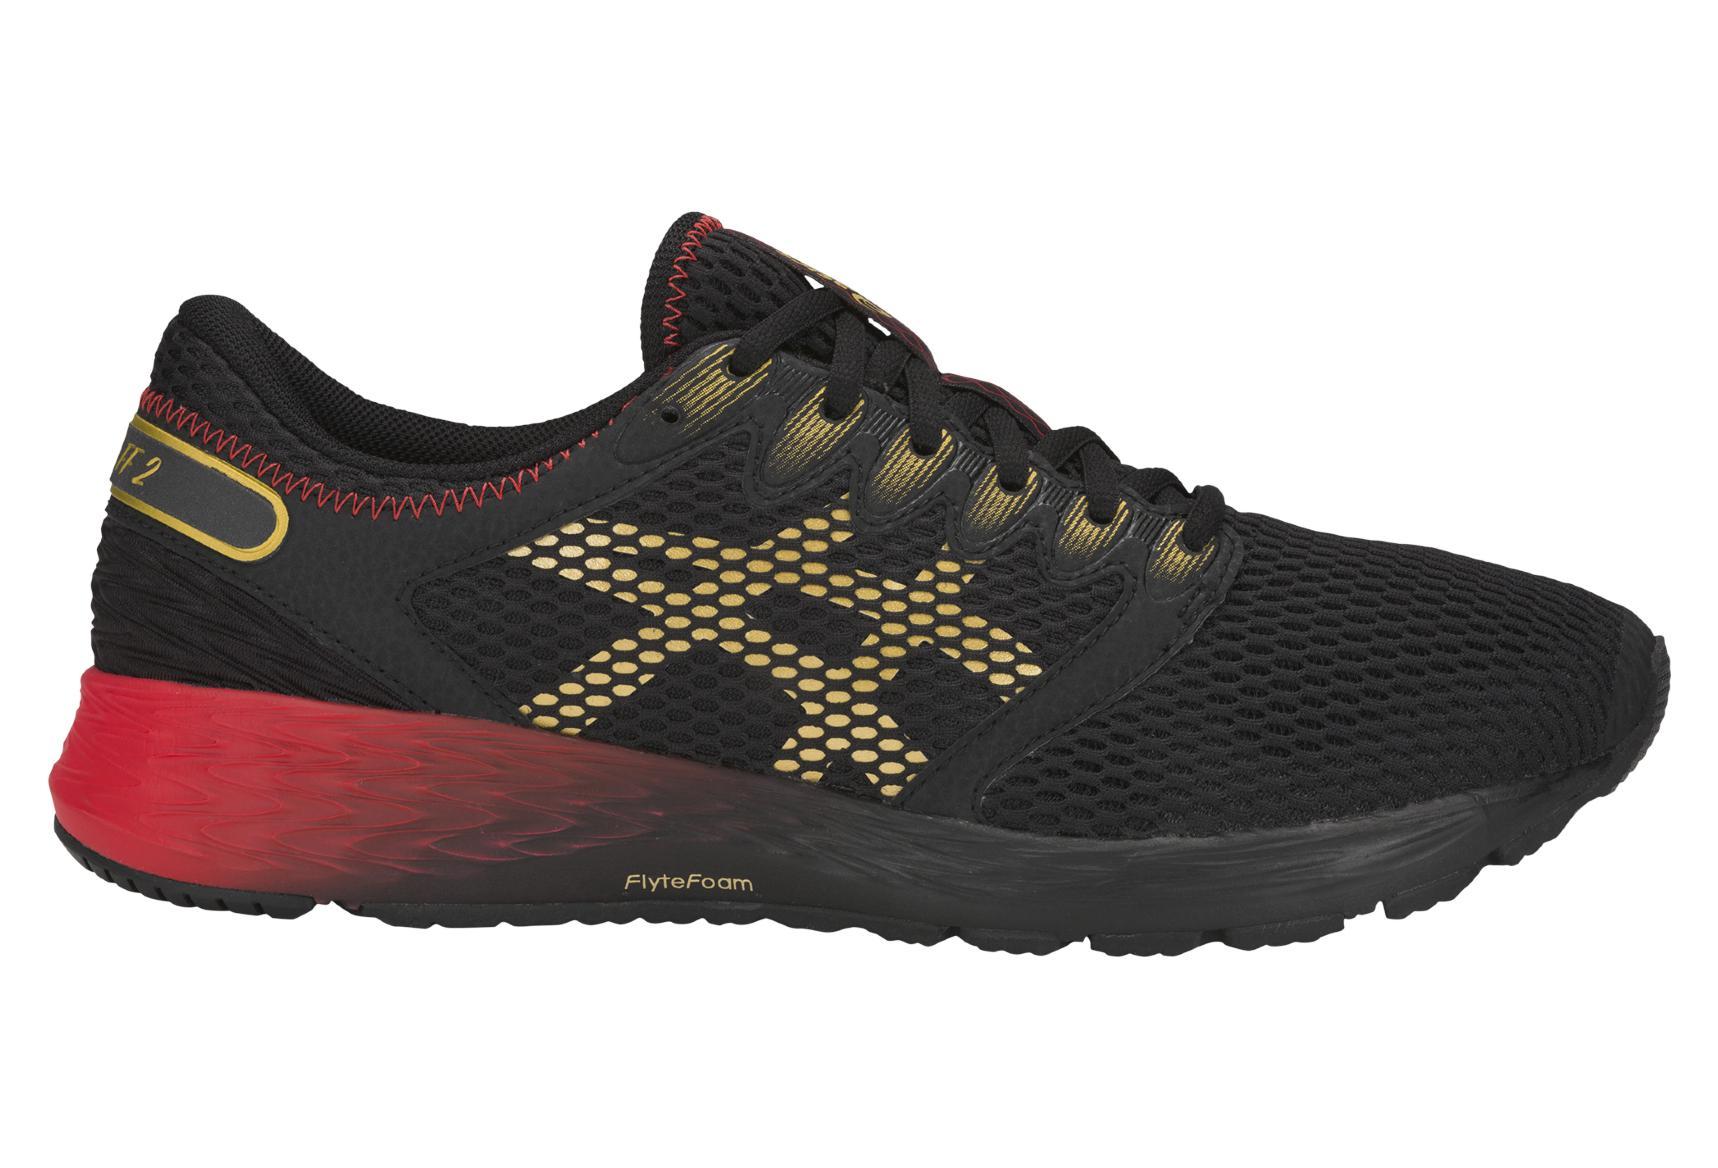 Asics Shoes Run Roadhawk FF 2 MUGEN Black Red